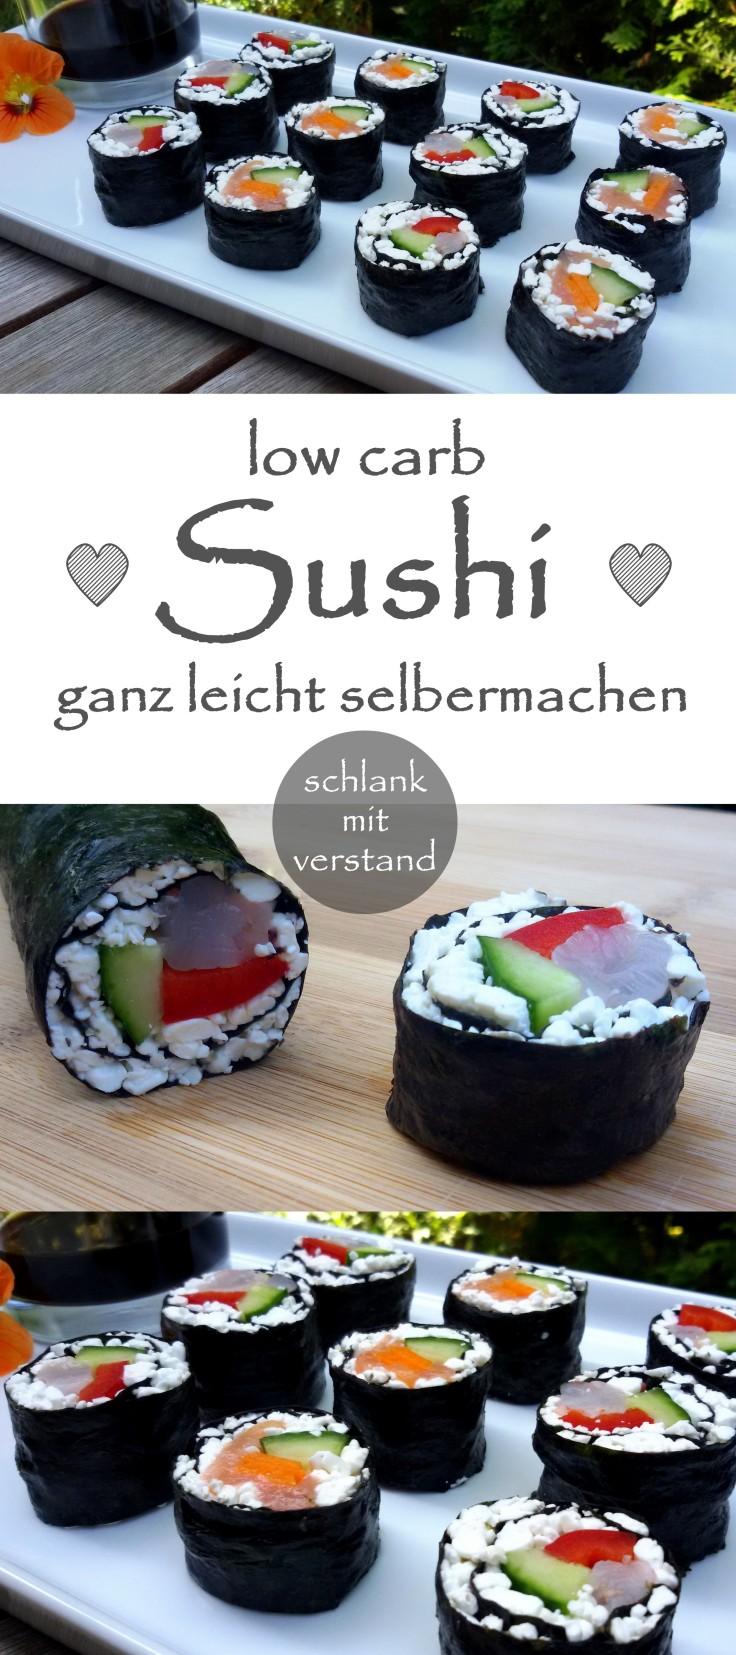 Sushi low carb selbermachen